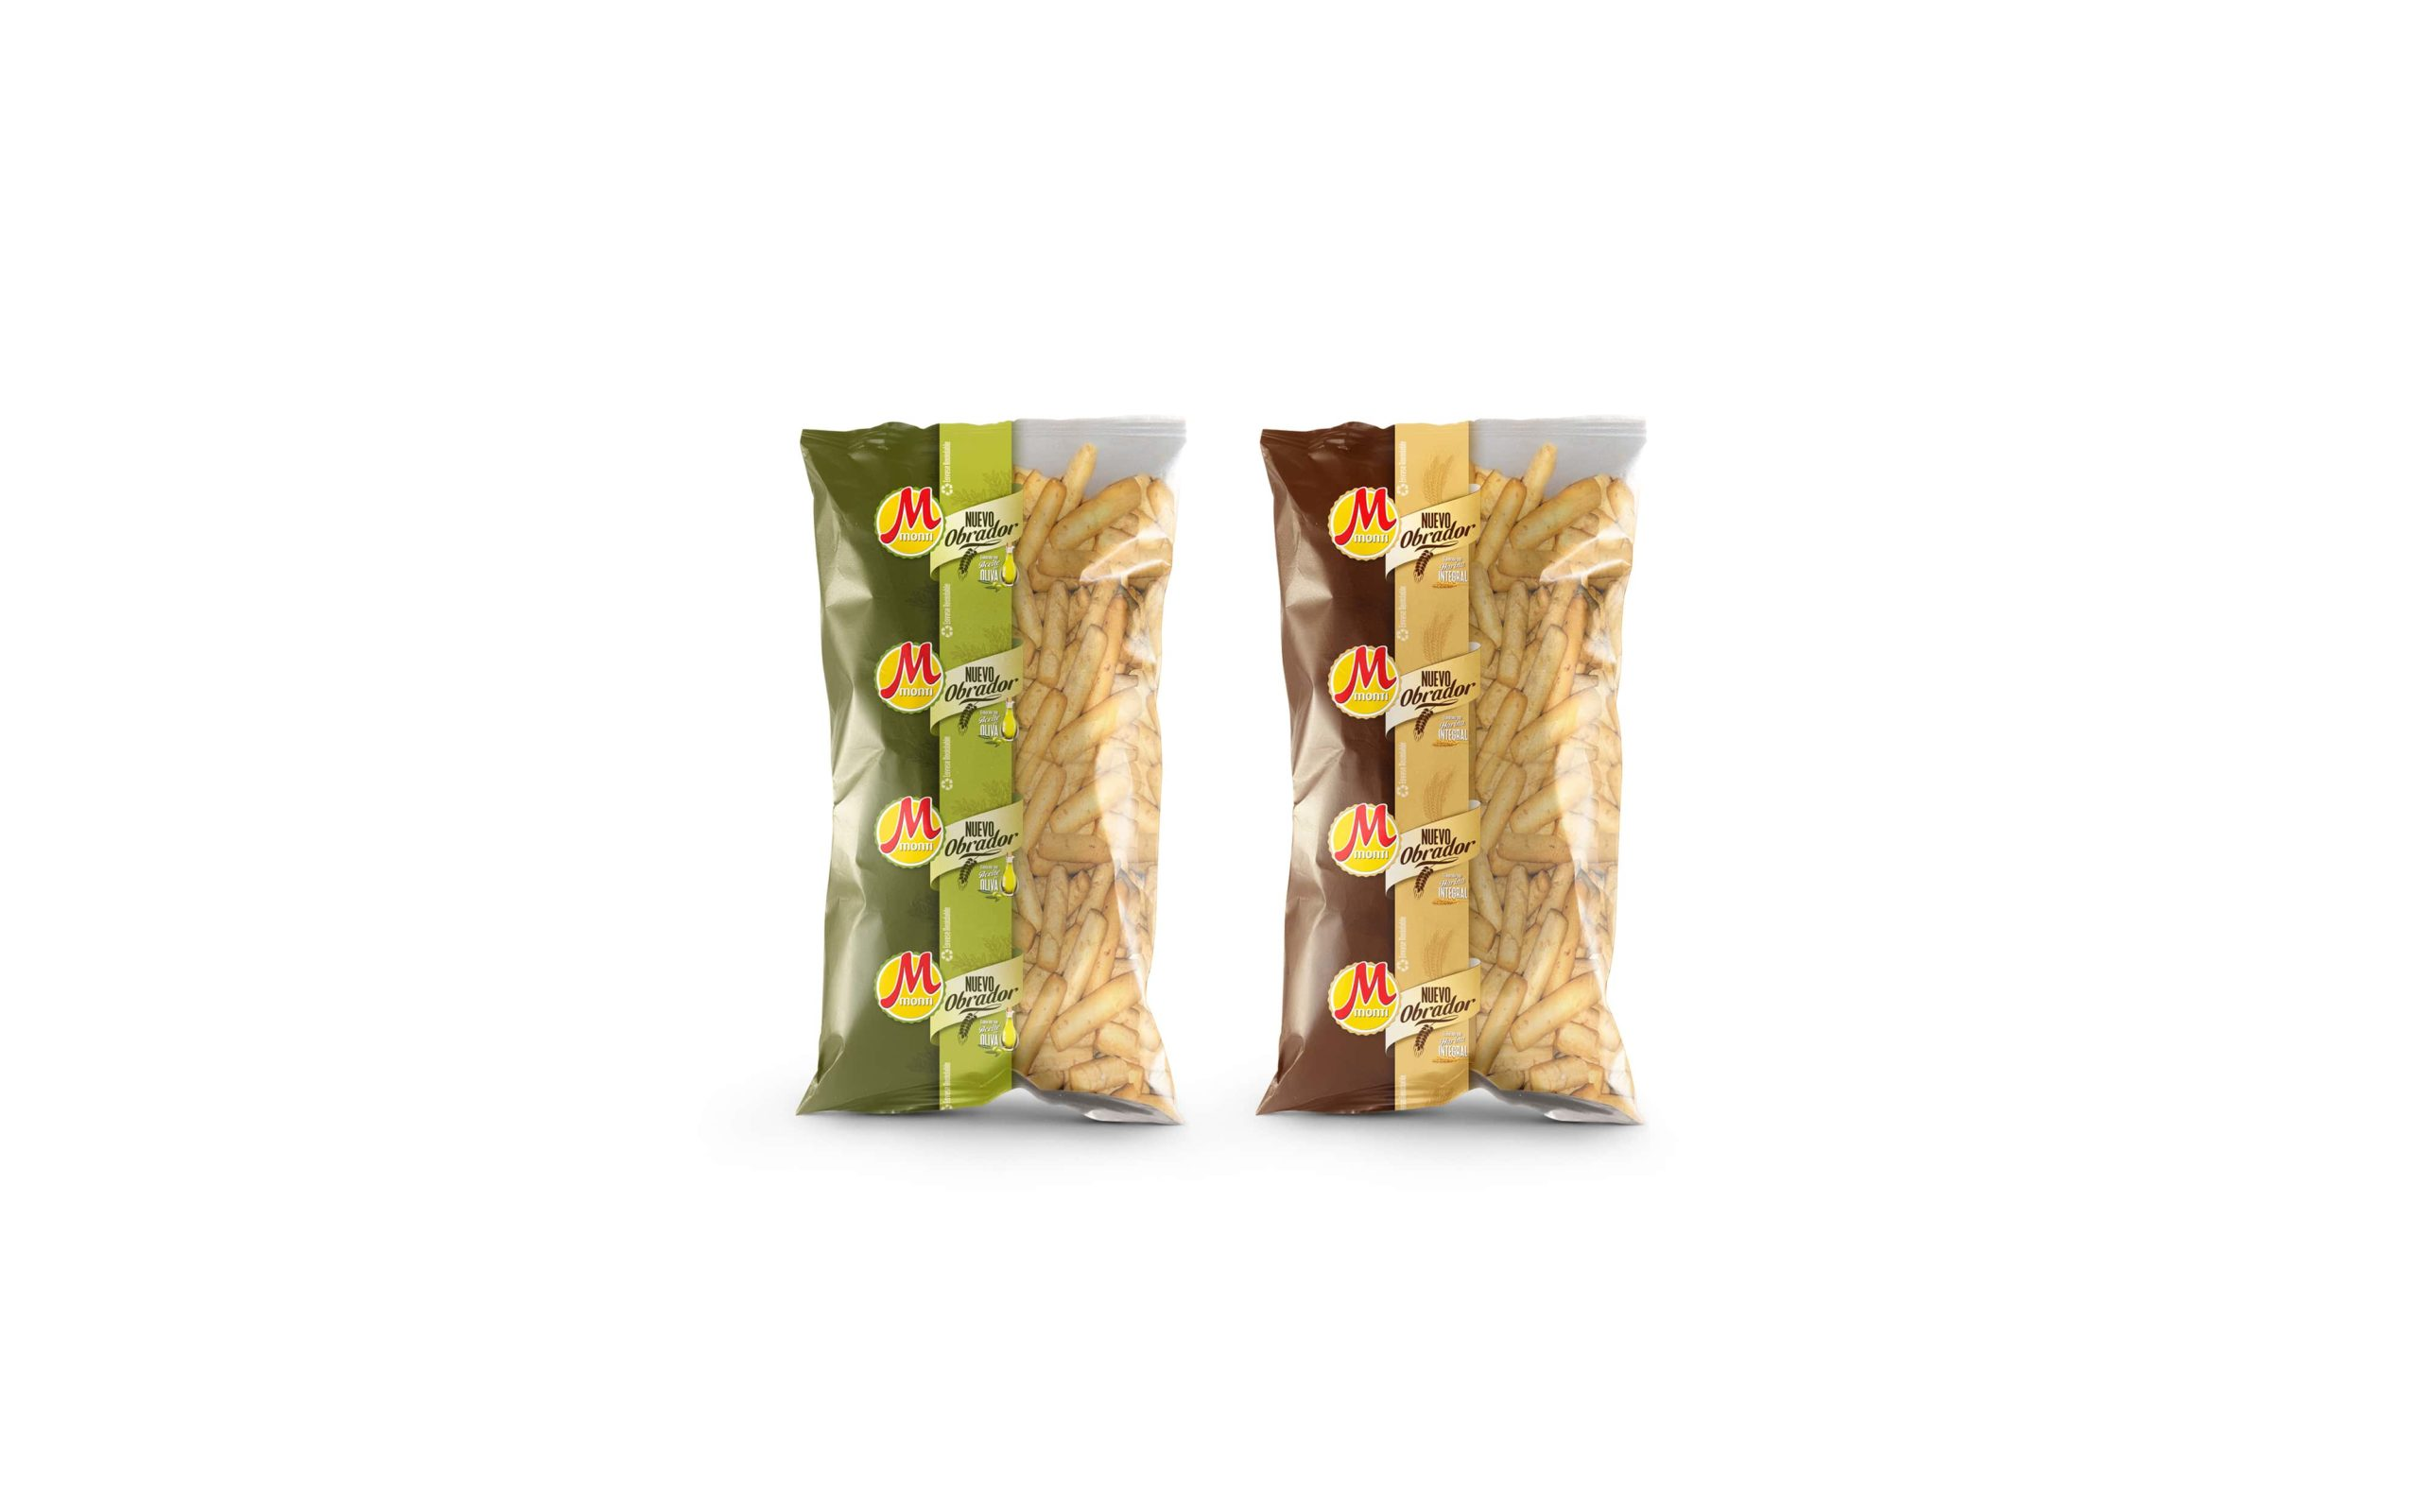 diseno-packaging-saluditos-01-min